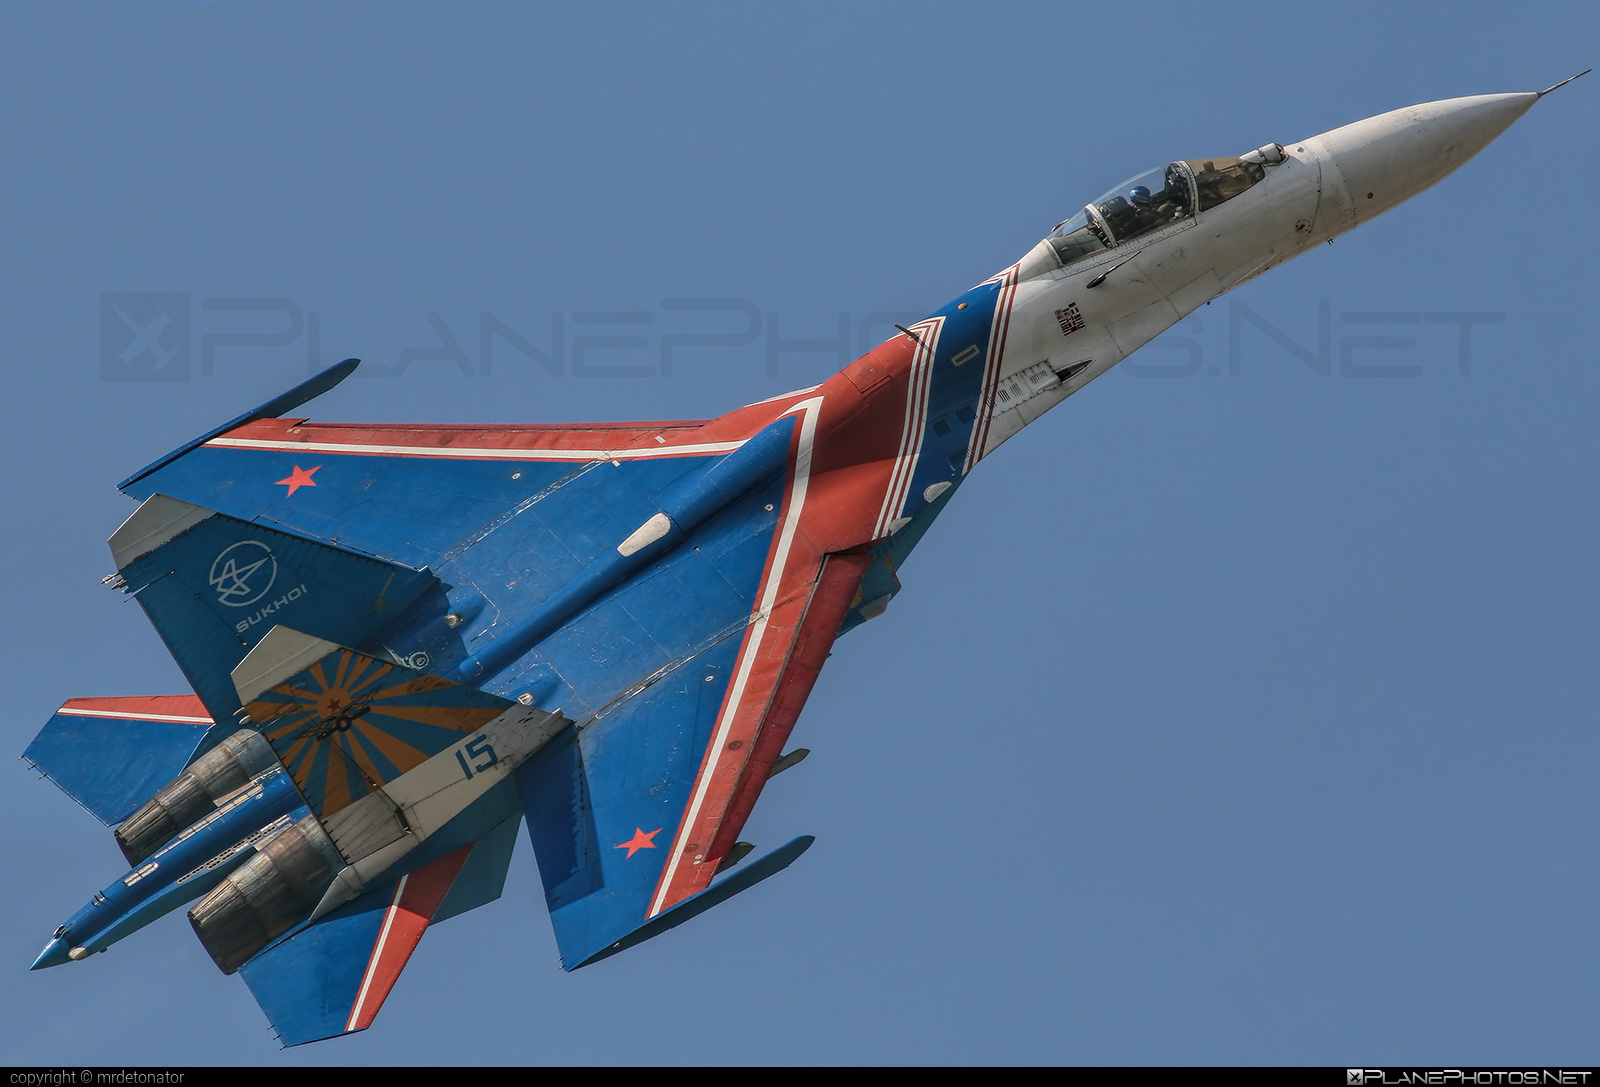 Sukhoi Su-27P - 15 operated by Voyenno-vozdushnye sily Rossii (Russian Air Force) #maks2007 #su27 #su27p #sukhoi #sukhoi27